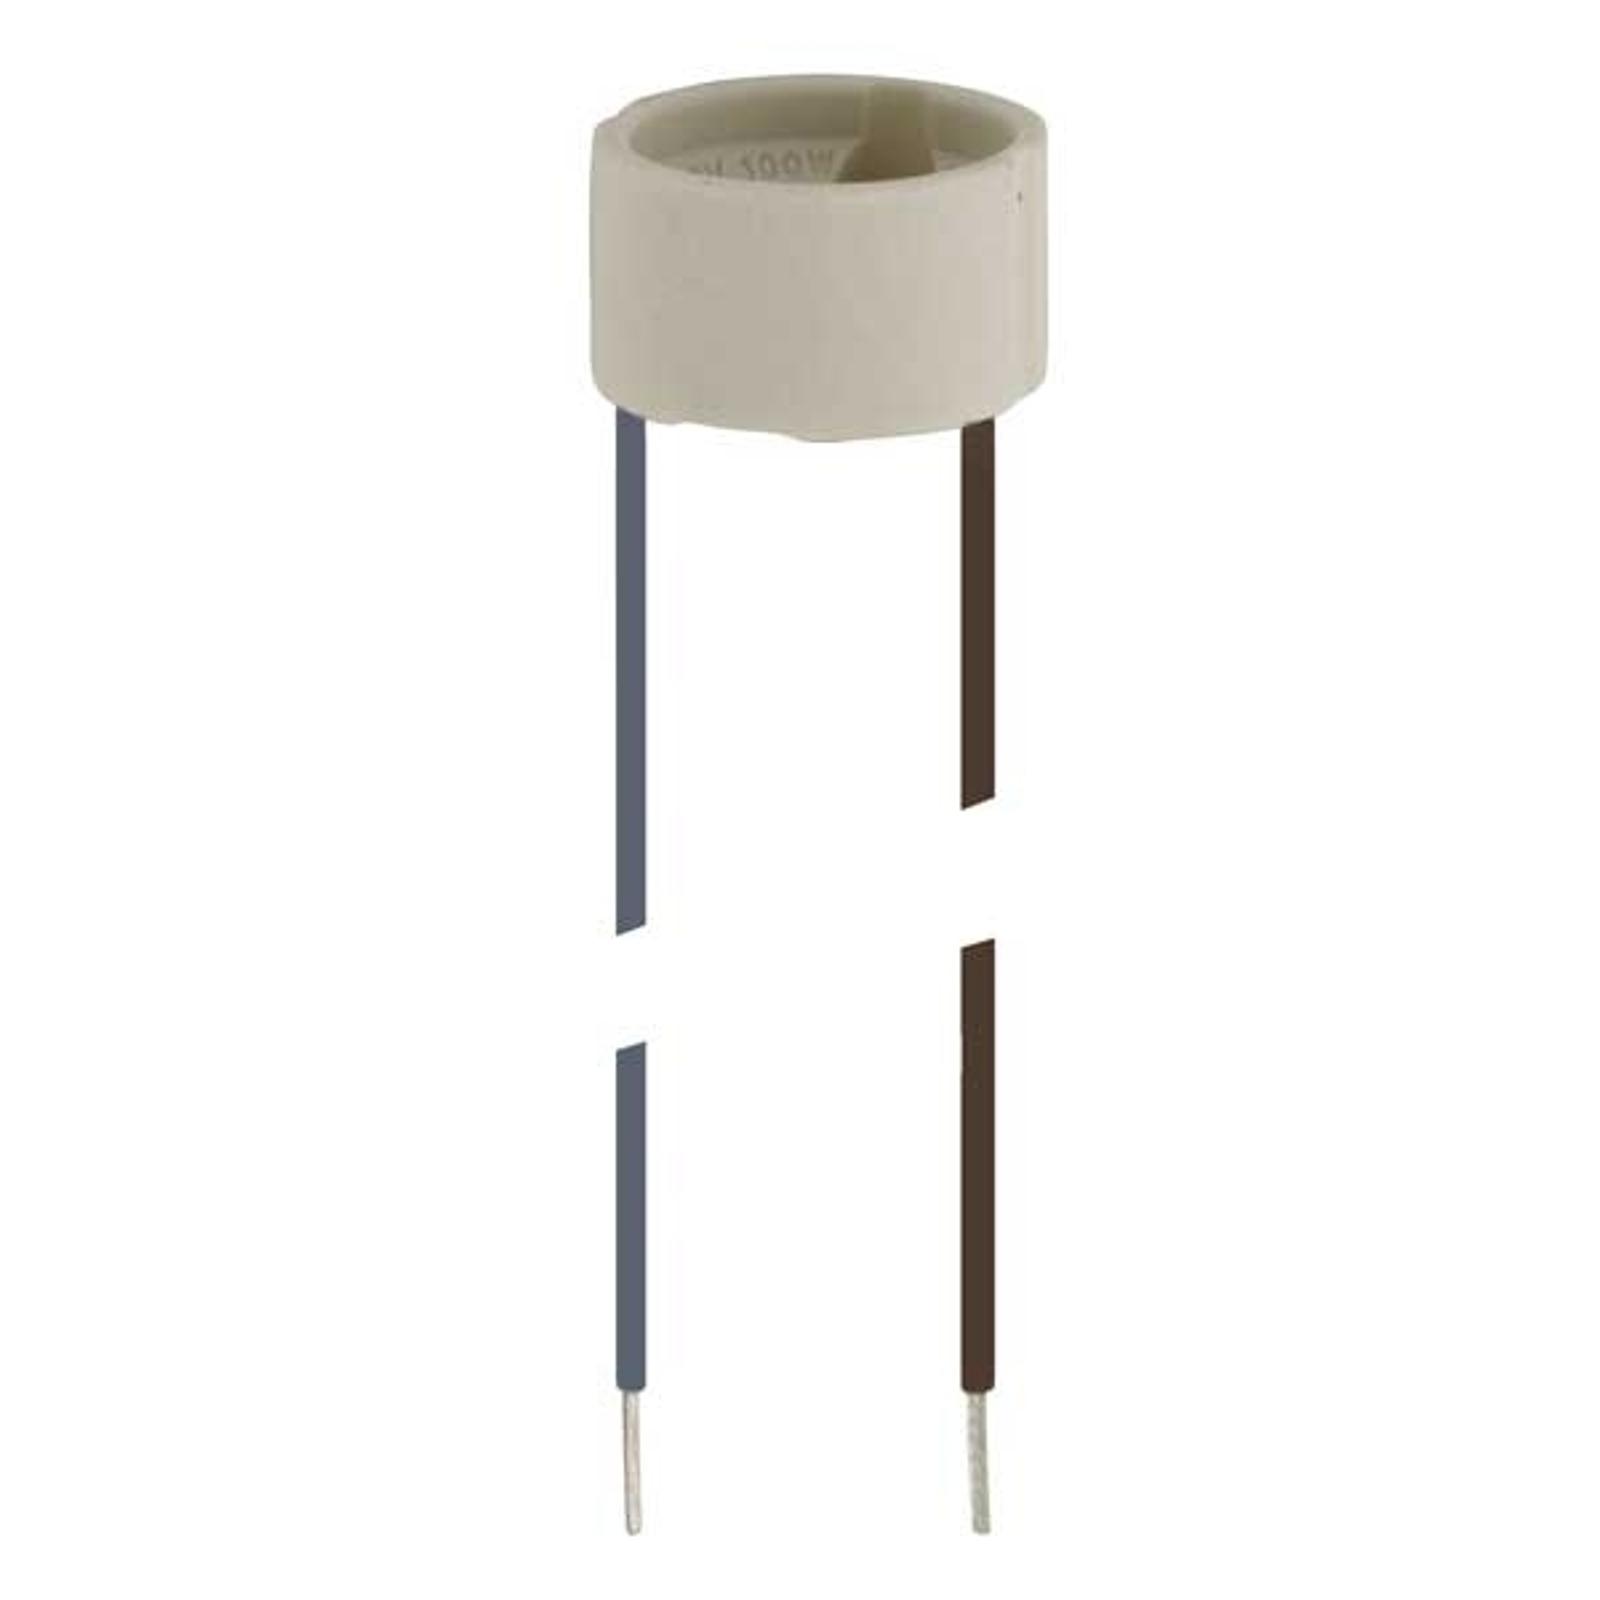 Casquillo de bombillas halógenas HV casquillo GU10